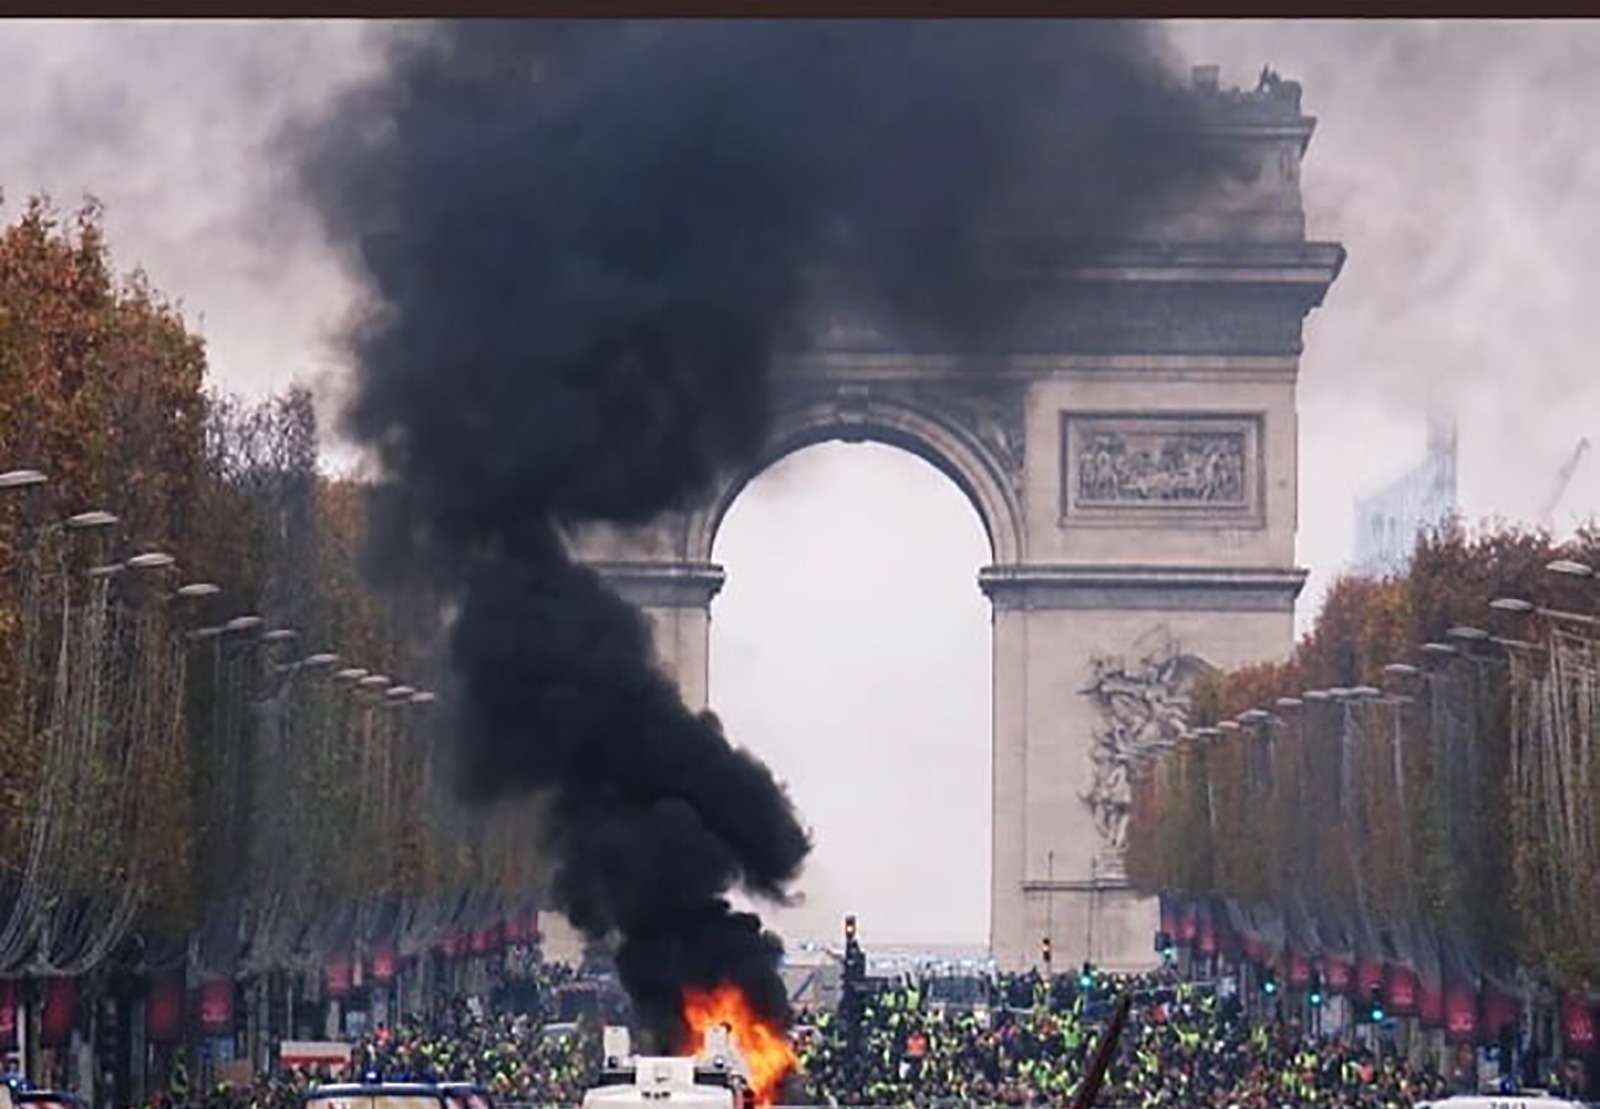 Какфранцузы протестуют против роста цен натопливо: баррикады против водометов— фото 926171